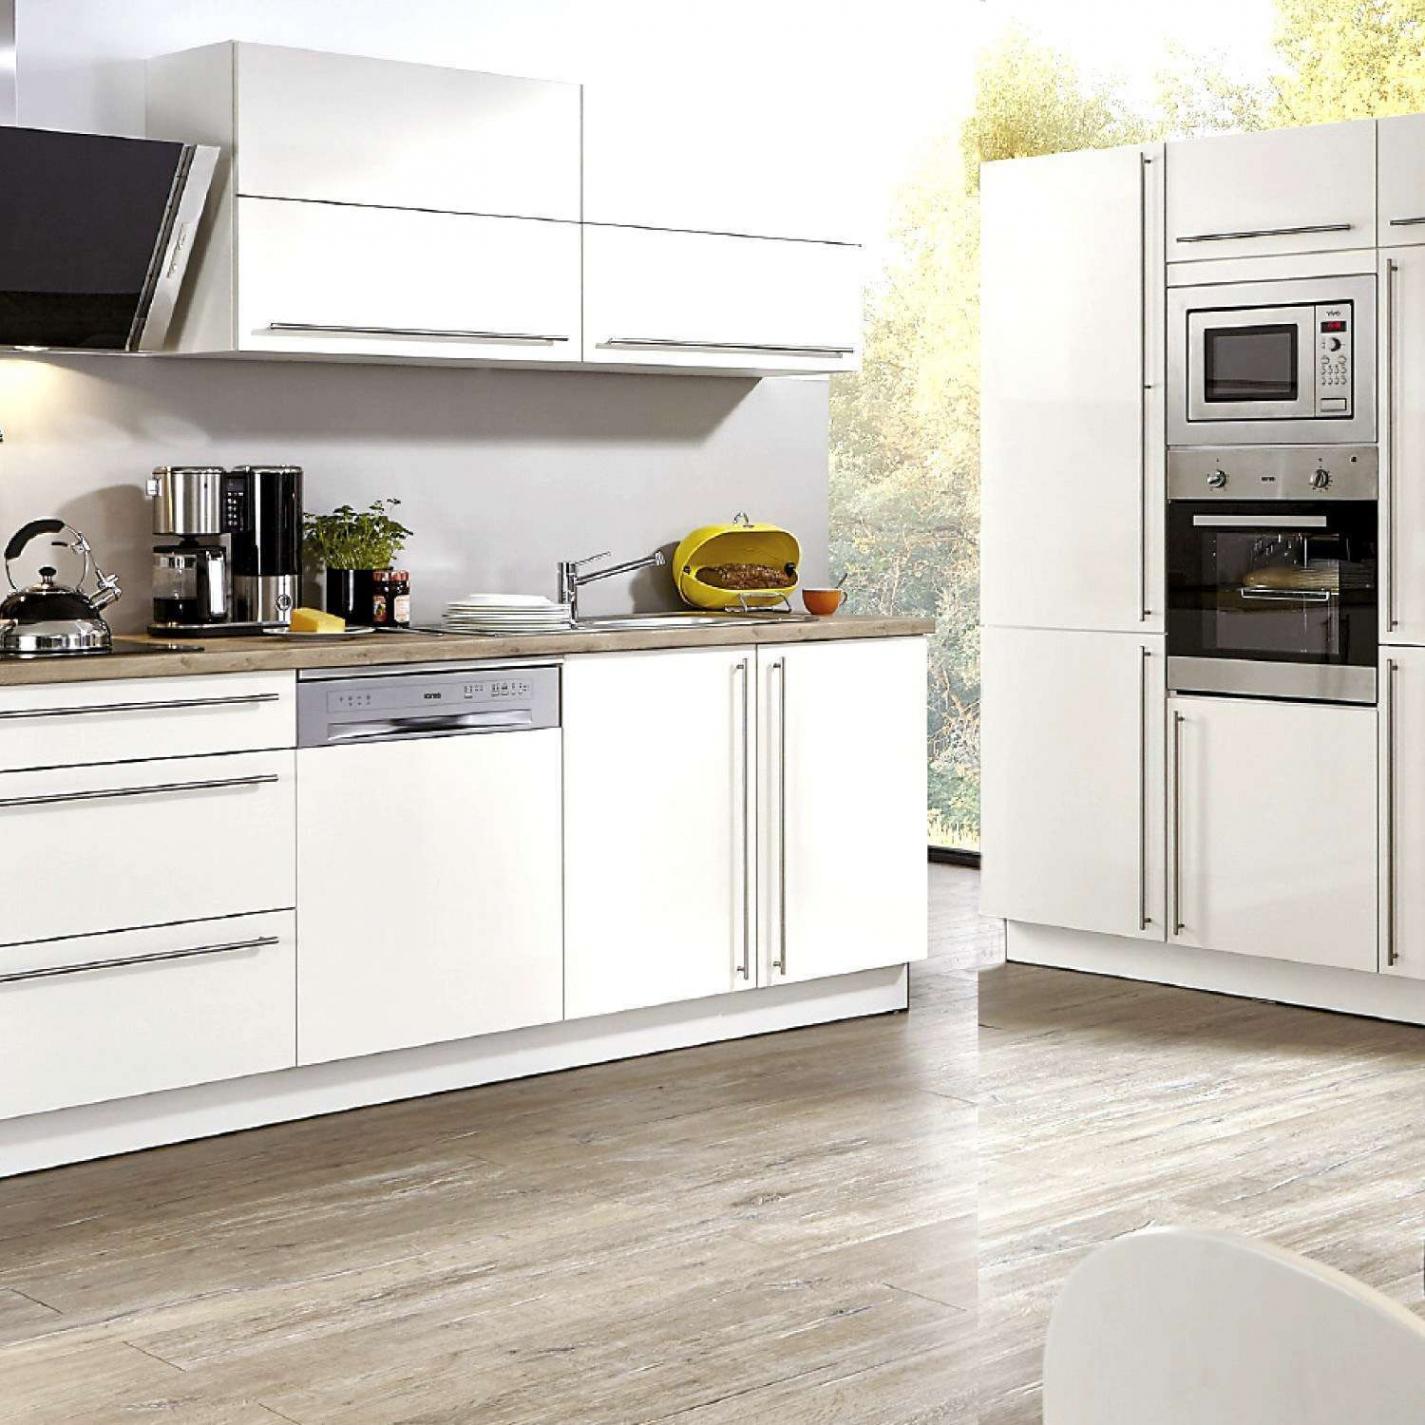 45 luxus deko ideen kuche galerie kuchen fur dachgeschosswohnungen kuchen fur dachgeschosswohnungen 5